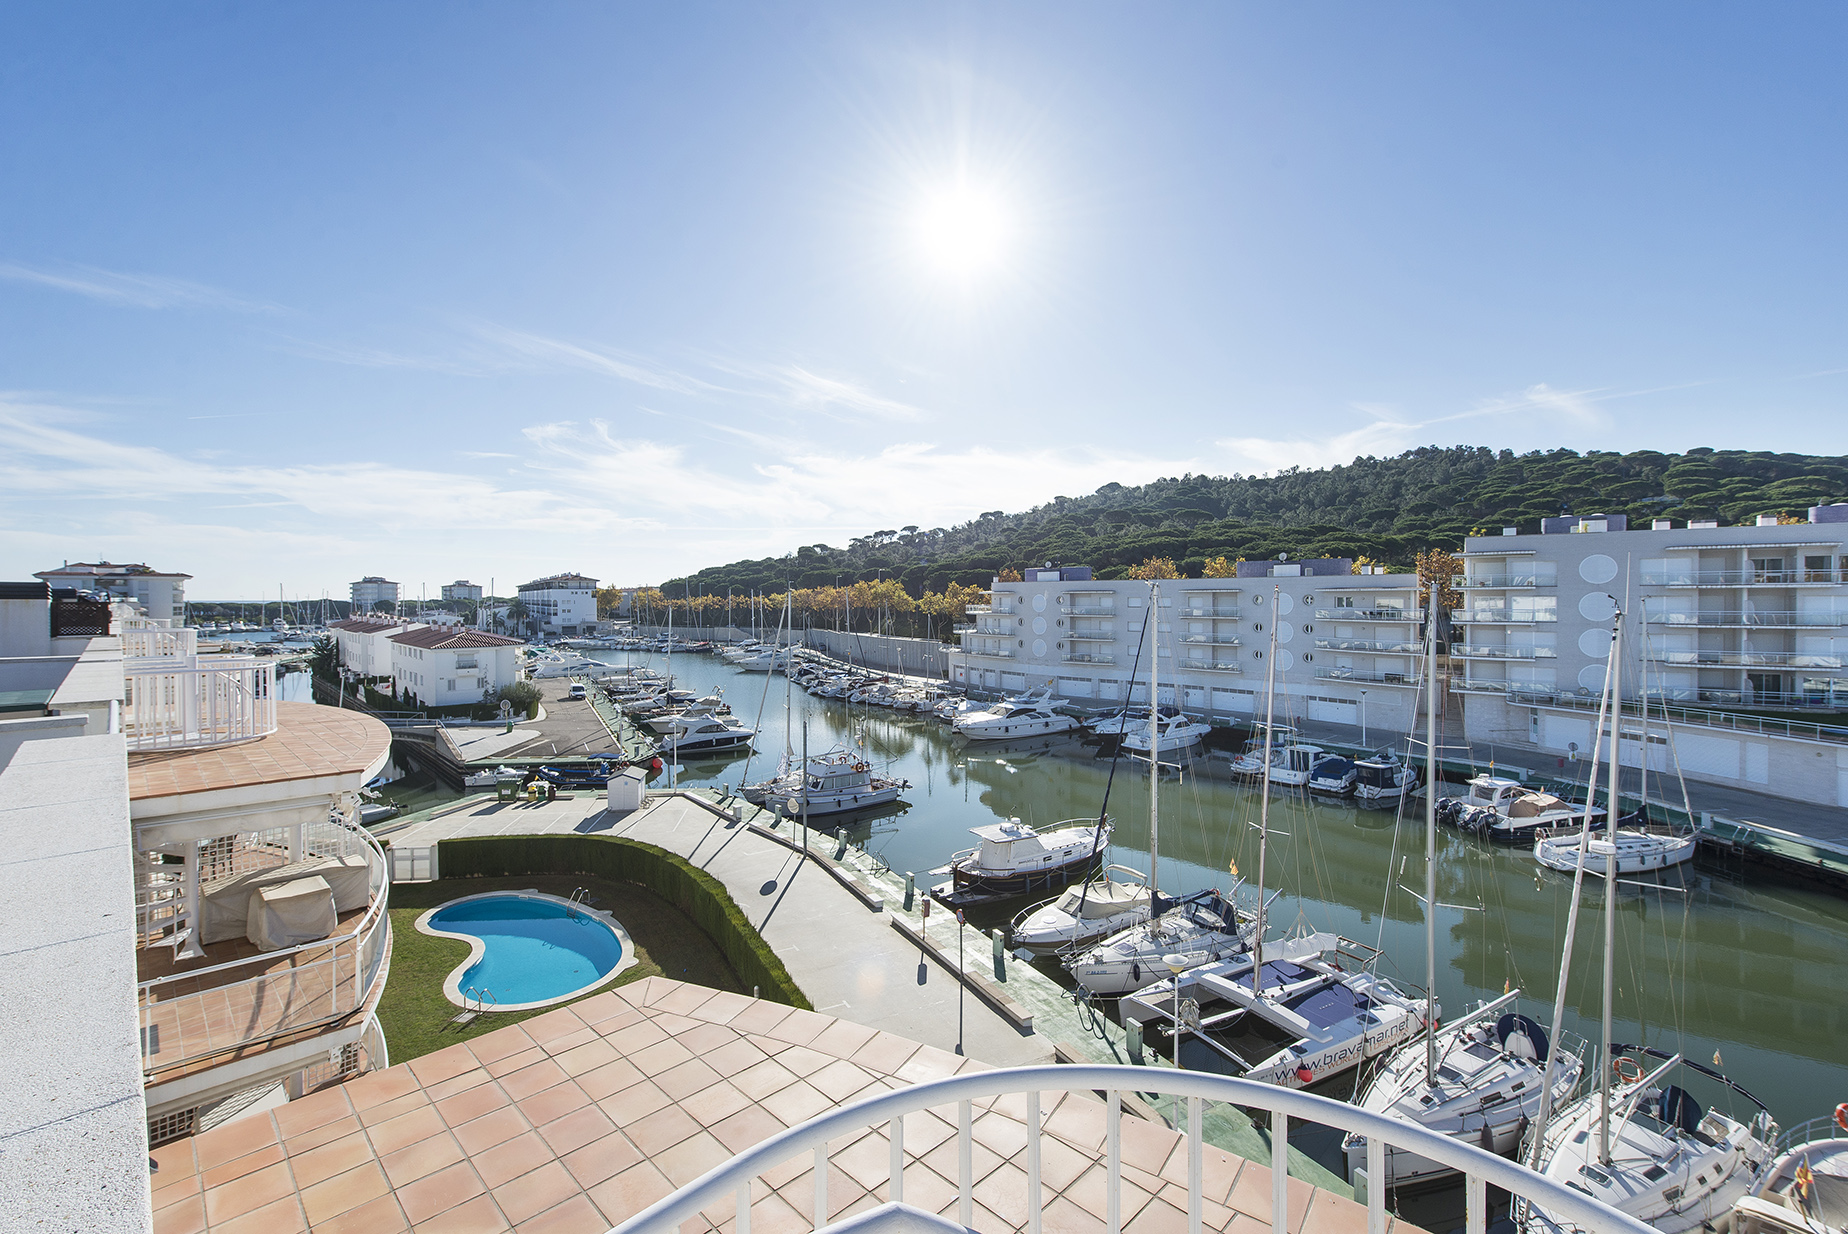 Apartment for Sale at Penthouse in the port of Playa de Aro Playa De Aro, Costa Brava 17250 Spain